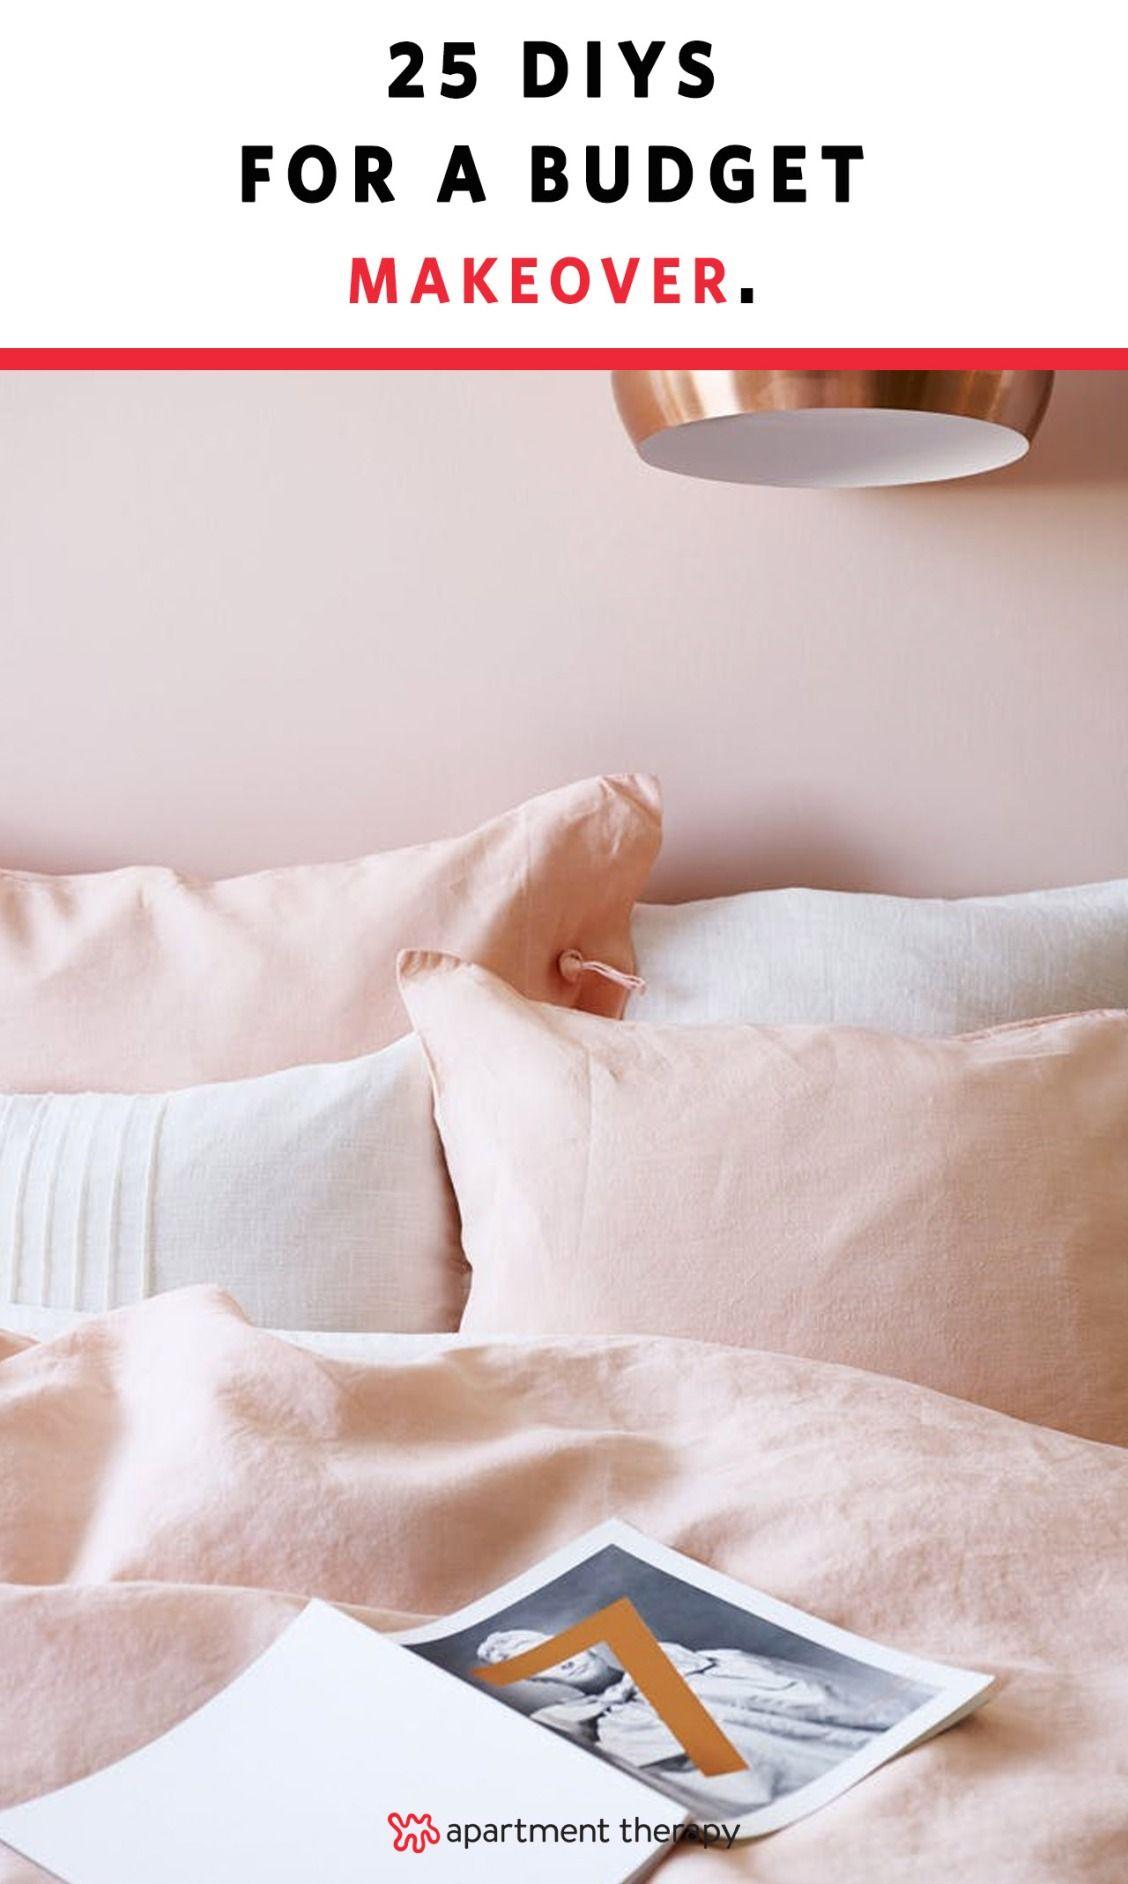 25 Stylish DIYs for a Beautiful Bedroom on a Budget | DIY ...